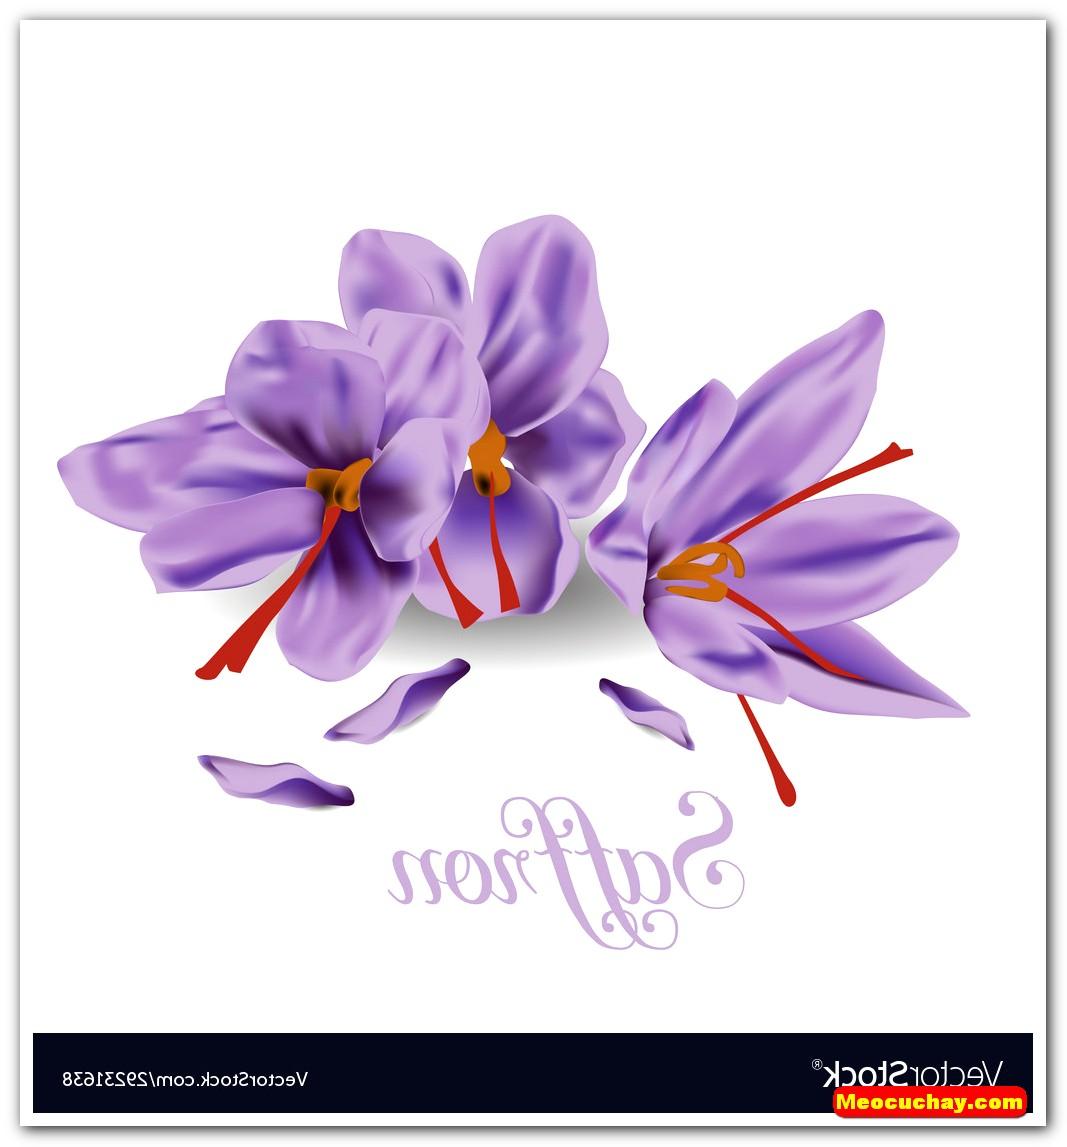 Nhuy-hoa-nghe-tay-saffron-iran (5)